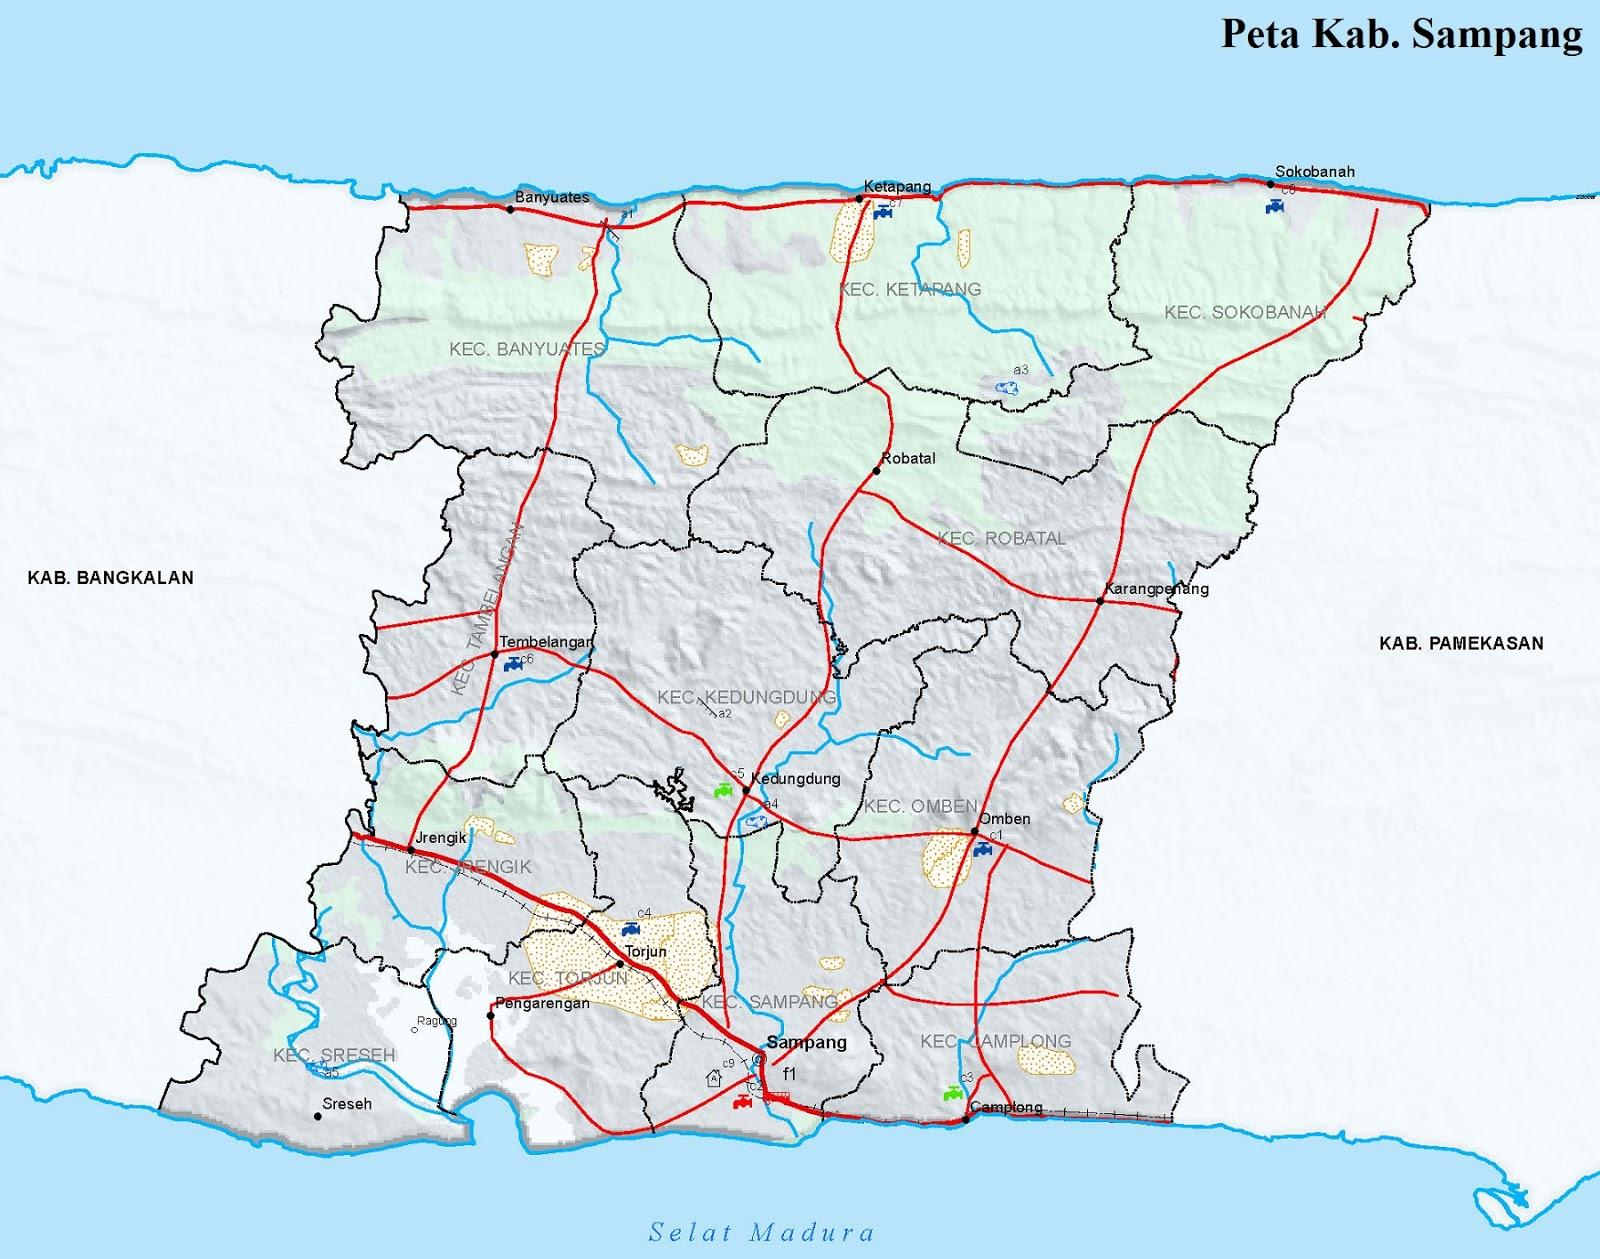 Gambar Peta Kabupaten Sampang HD